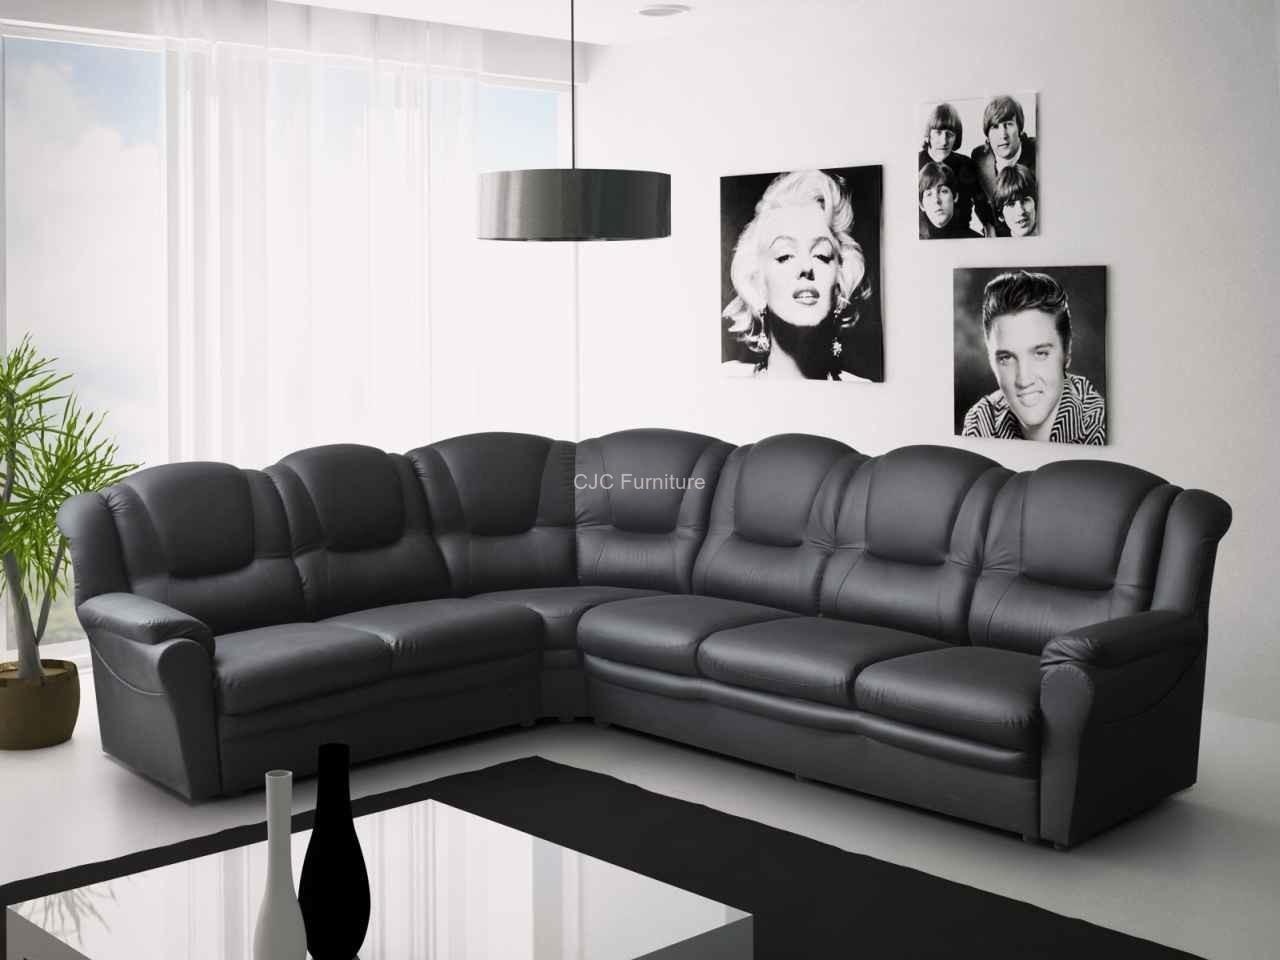 Bedding Purple Velvet Tufted Sofa Bed Futon Caravana Furniture For Black Corner Sofas (Image 3 of 20)